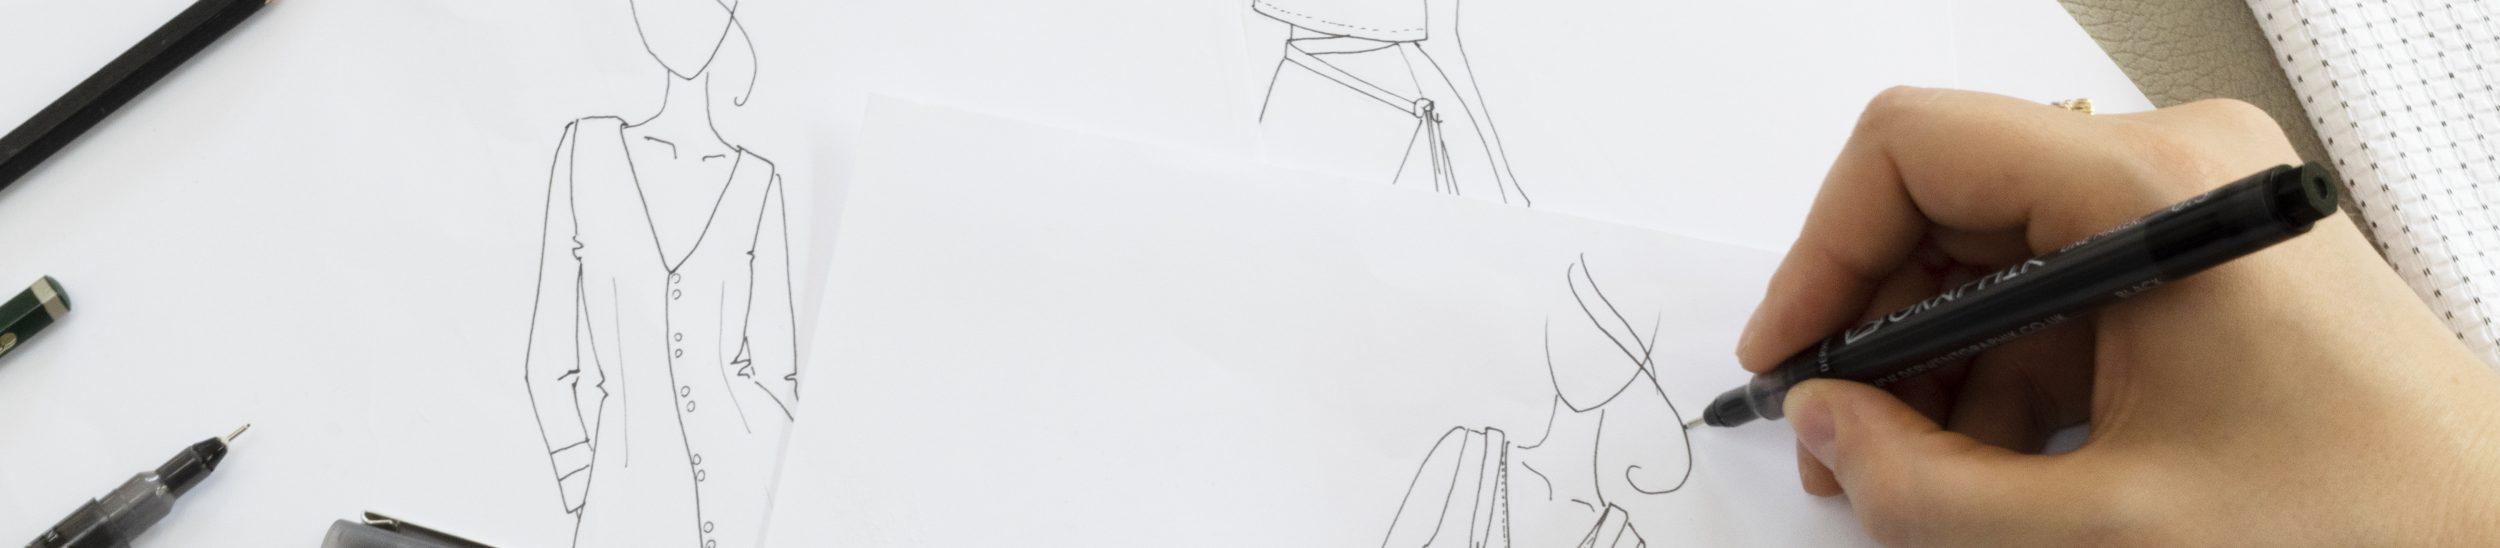 Amandine dessinant un croquis de la marque